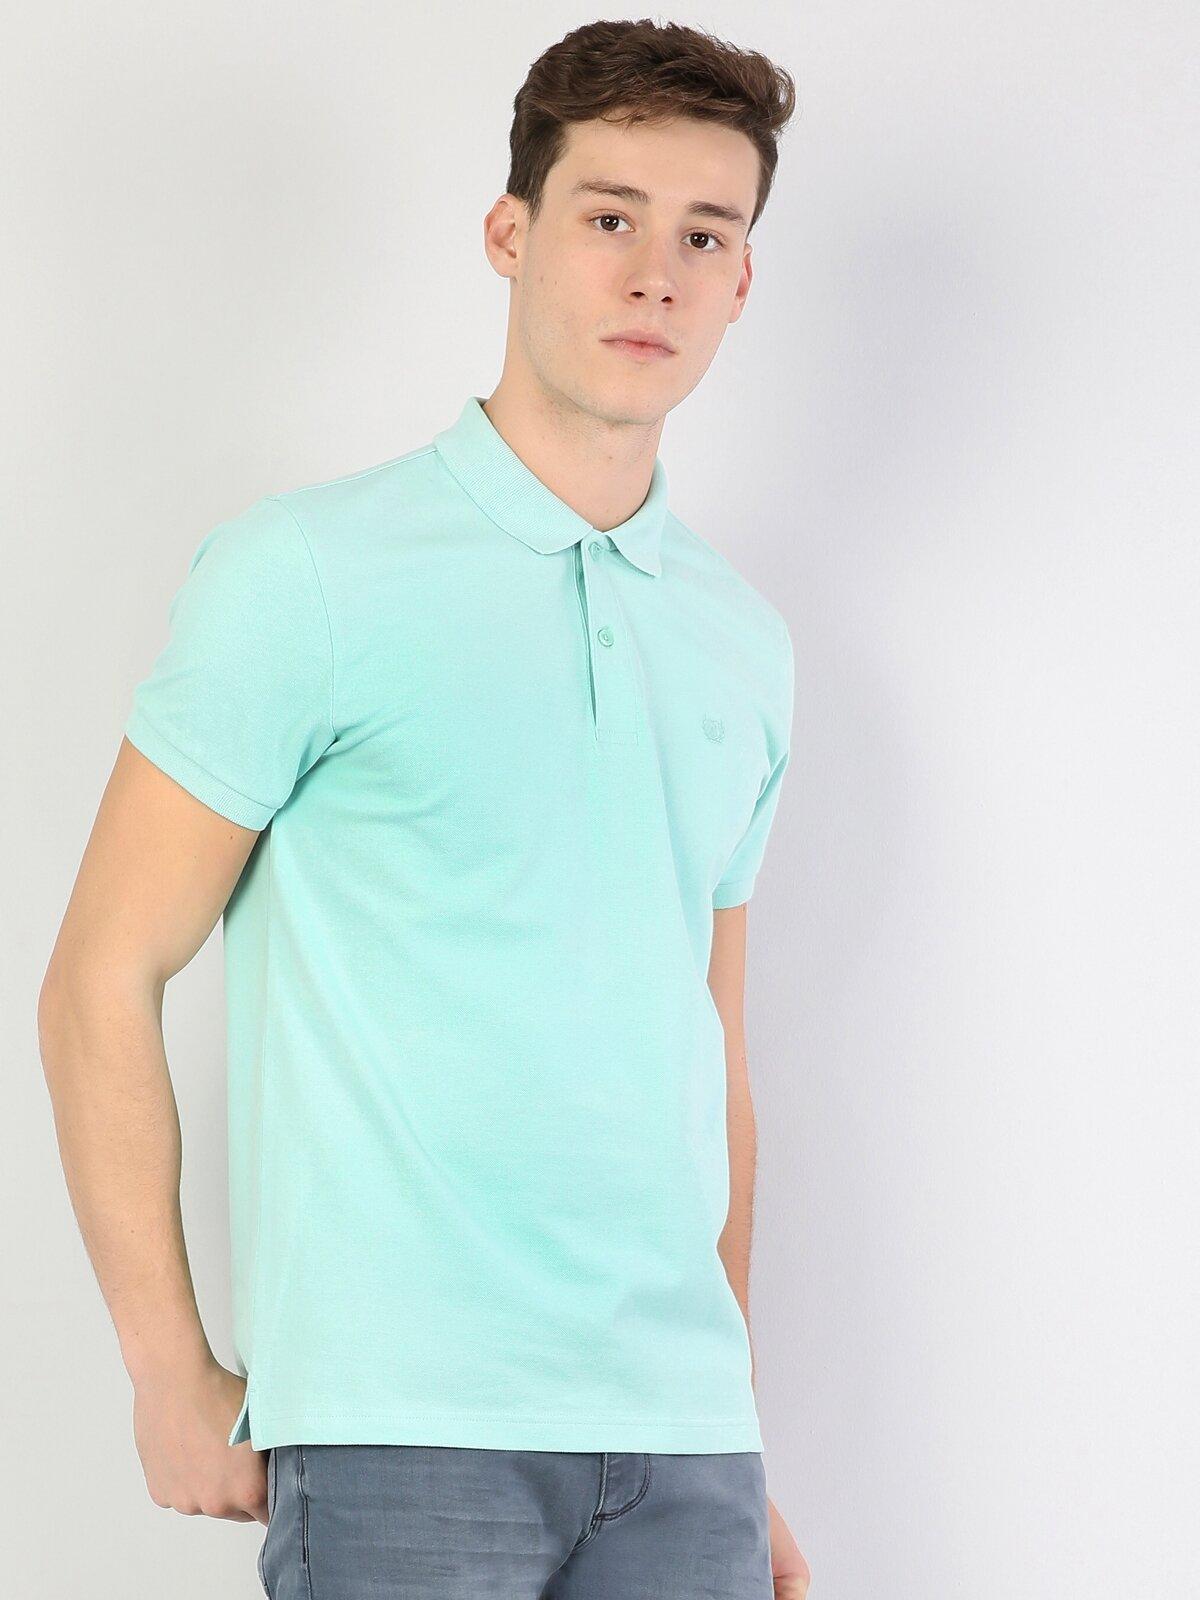 Polo Yaka Mint Yeşili Kısa Kol Tişört